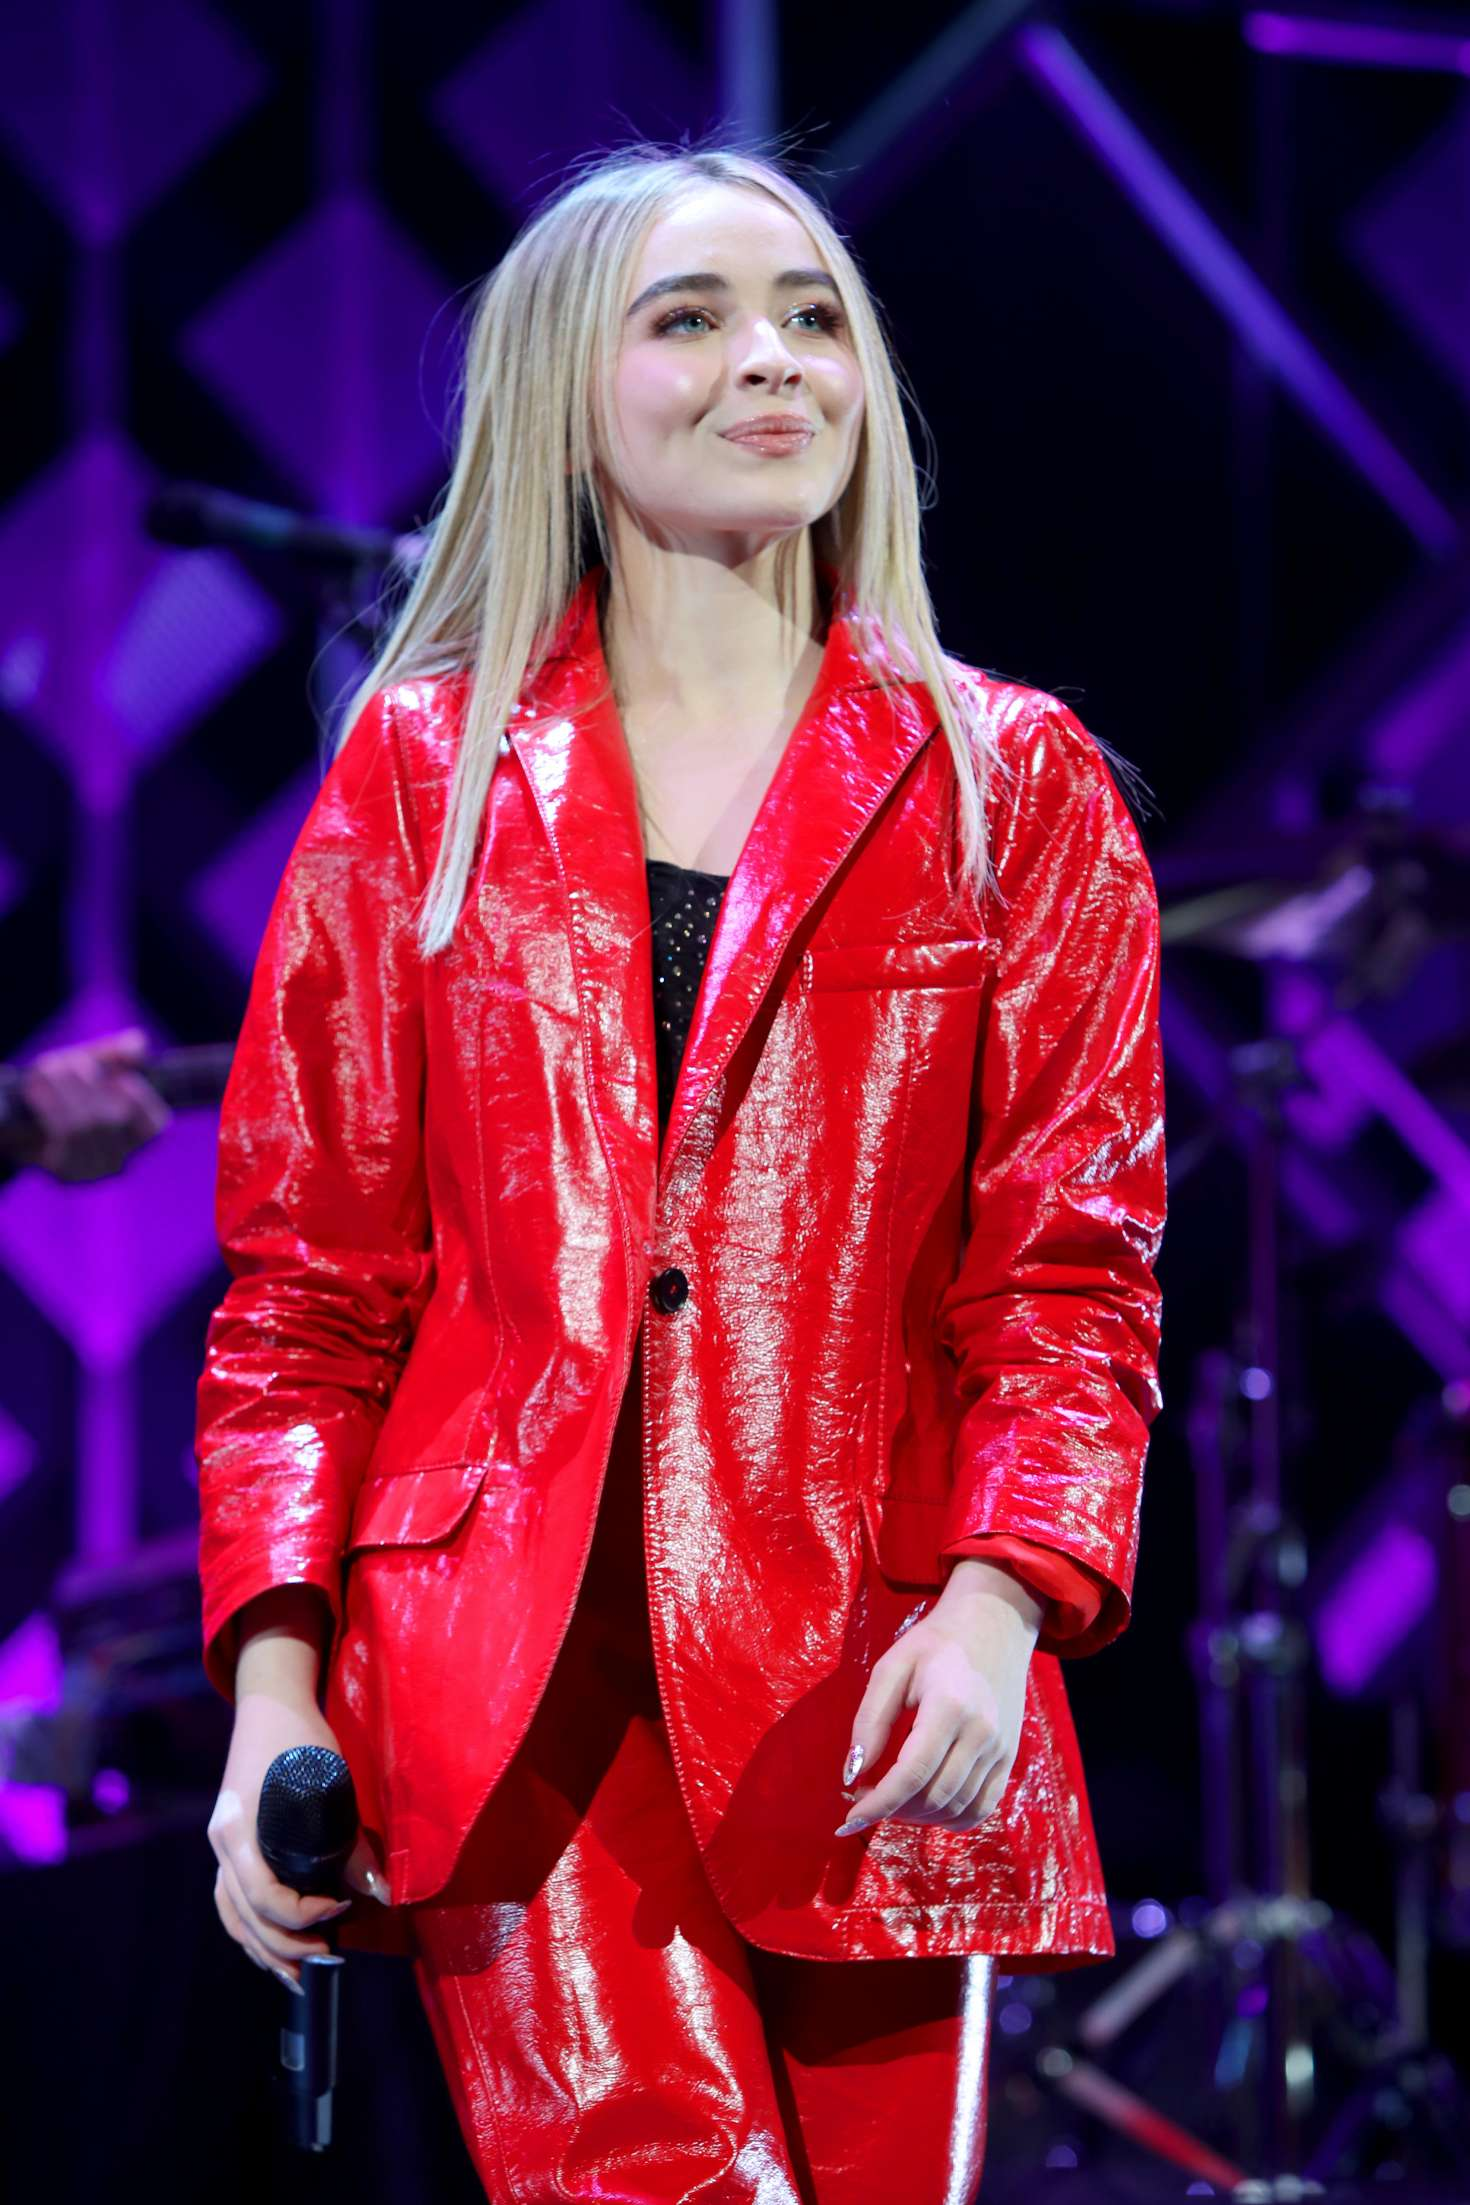 Sabrina Carpenter 2018 : Sabrina Carpenter: iHeart Radio Jingle Ball Performance -04